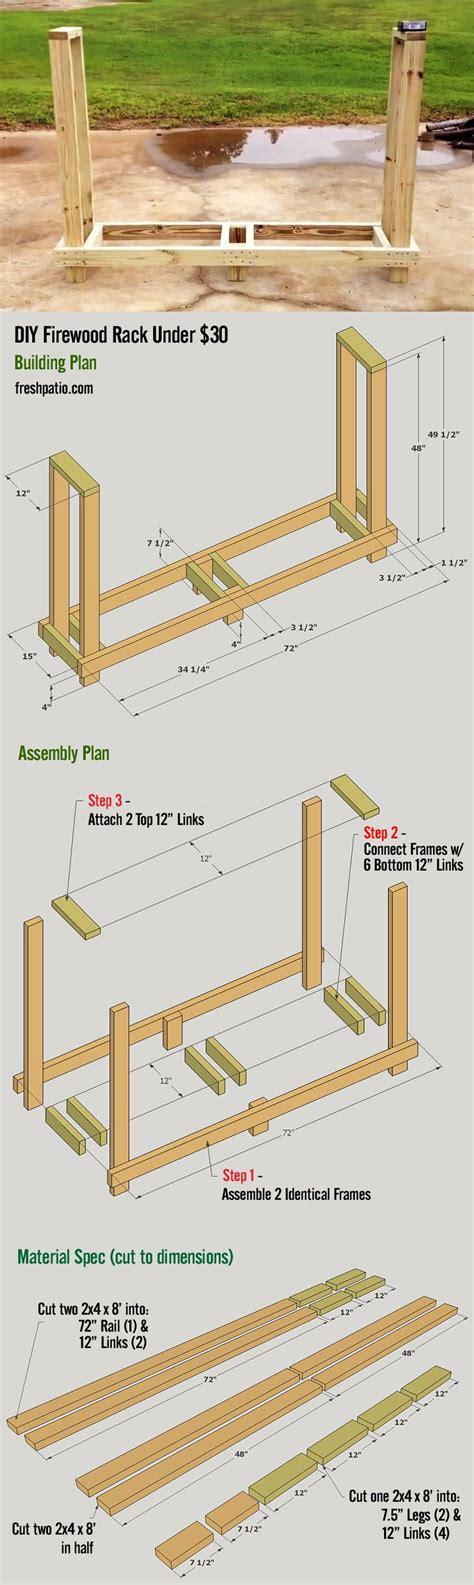 firewood rack plan easy  build